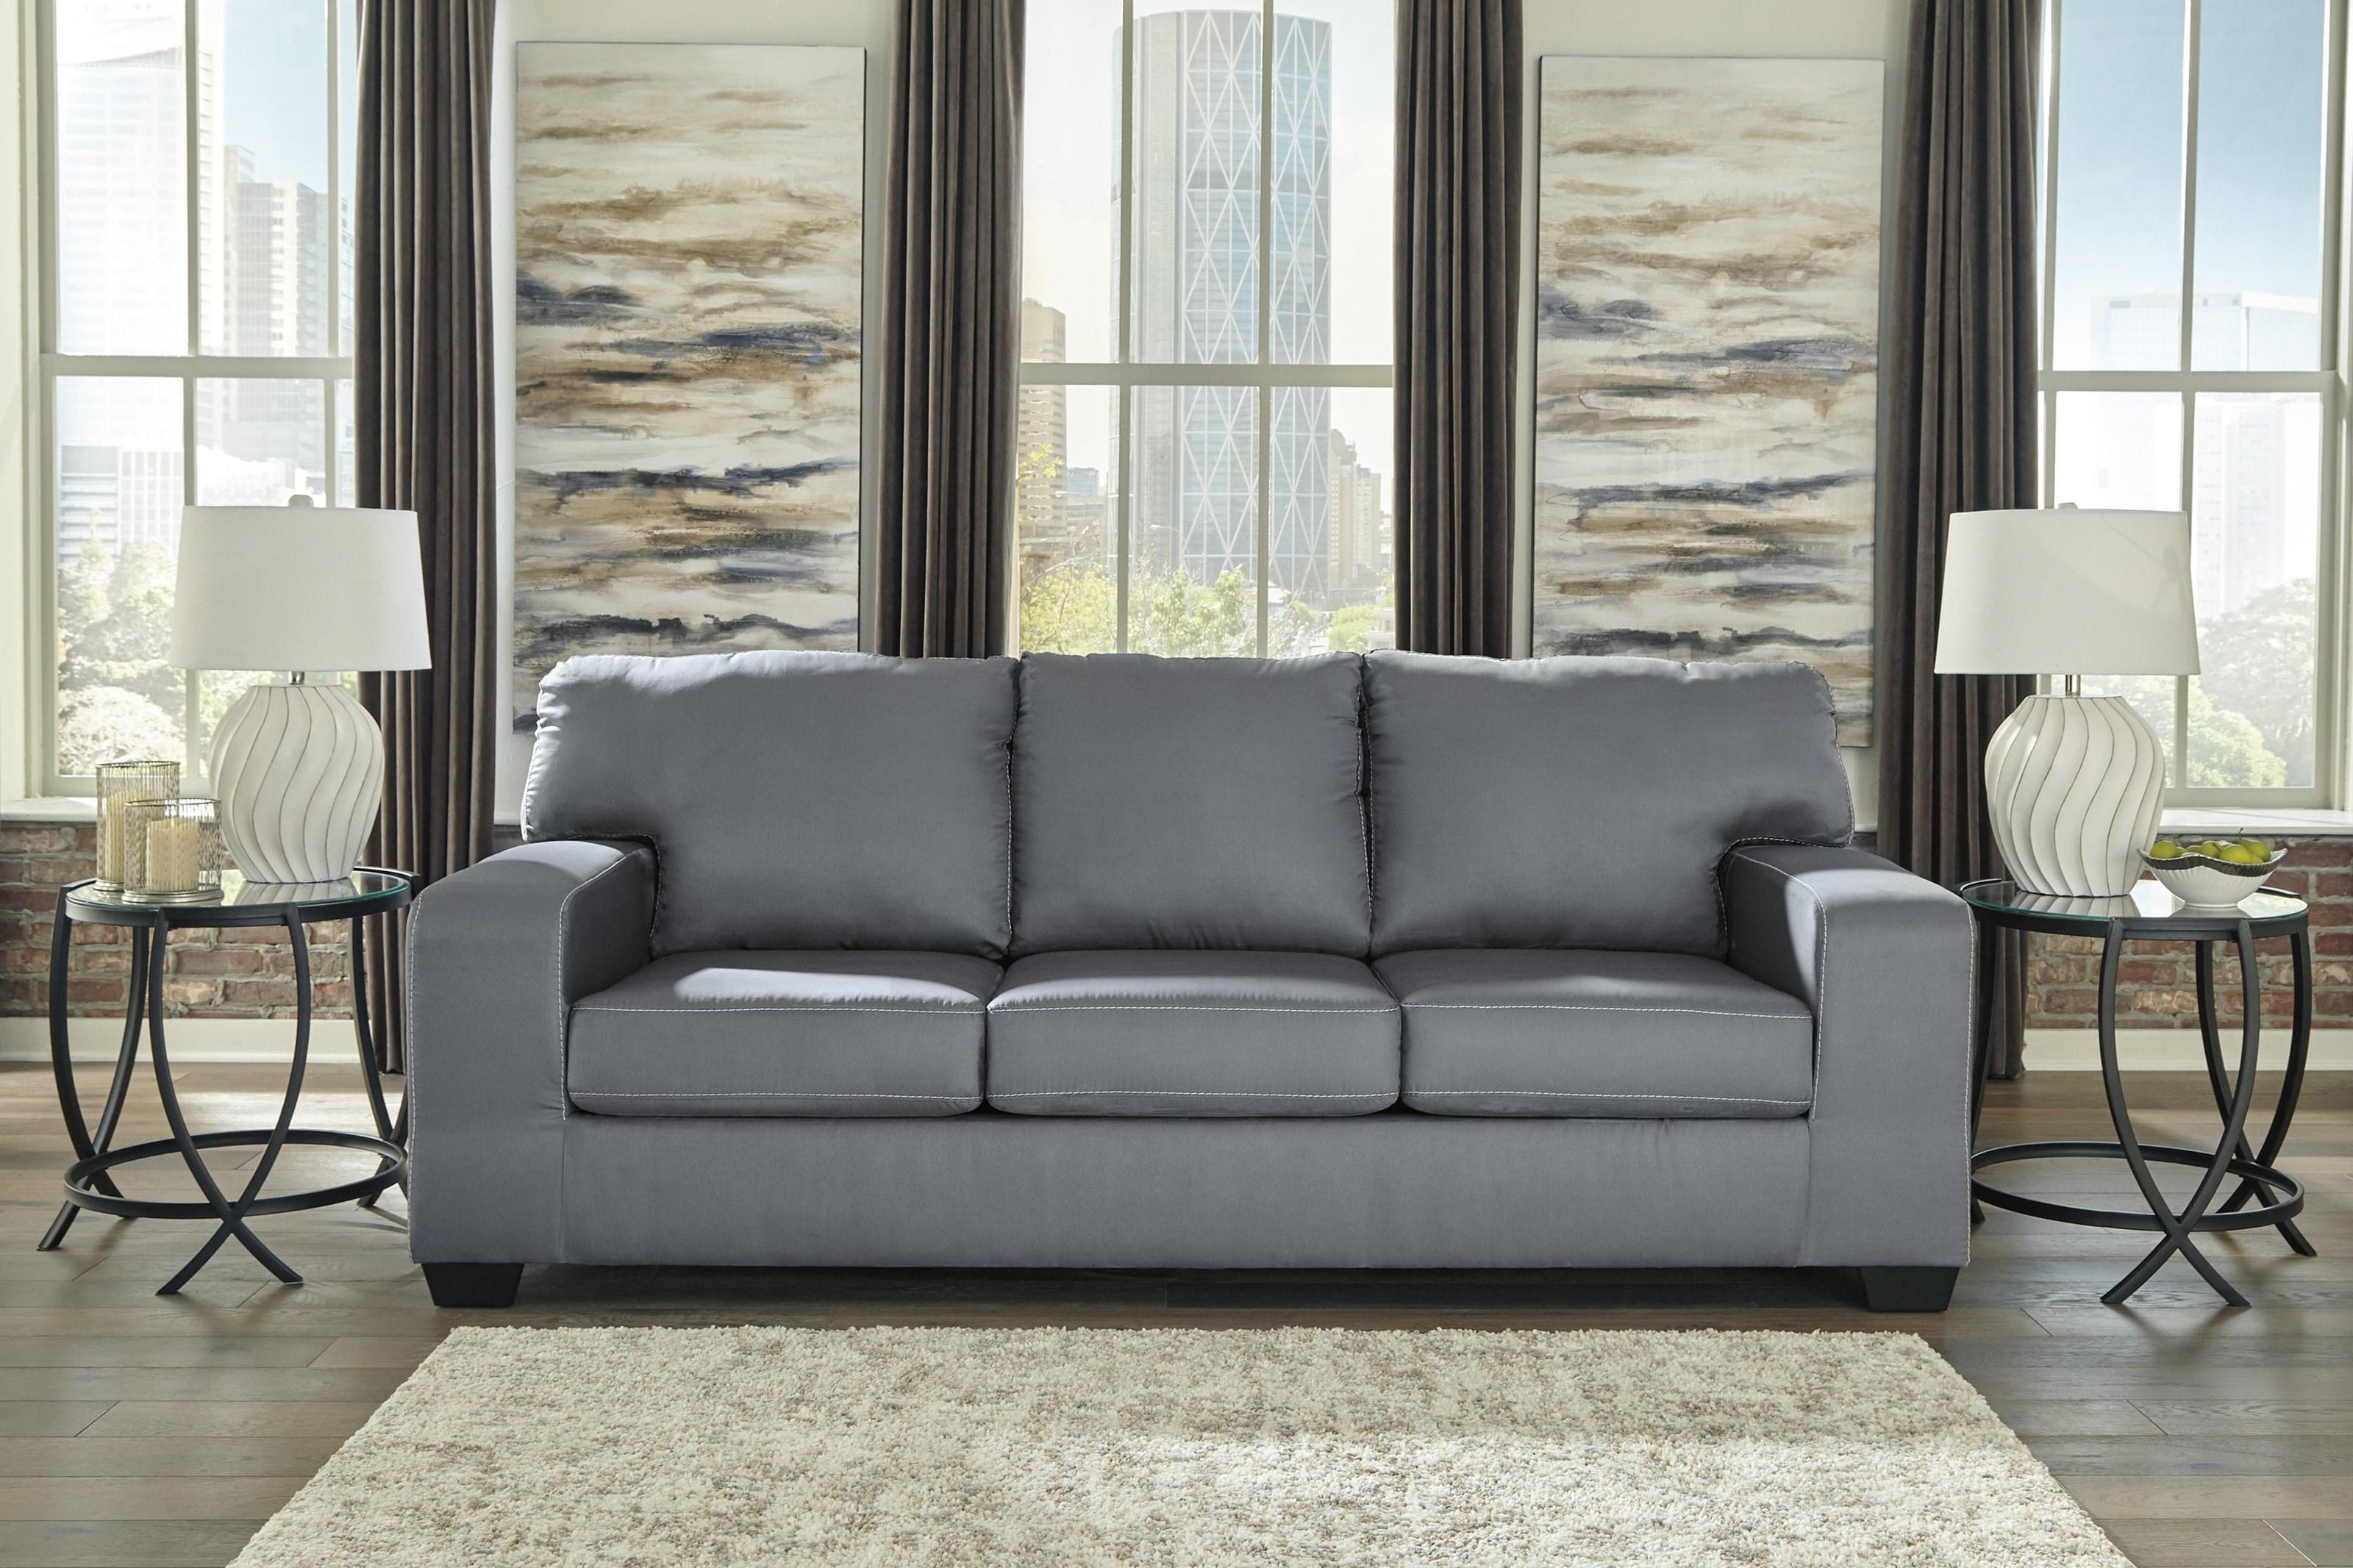 - Ashley Furniture Kanosh 4990339 Contemporary Sofa Sleeper Sam